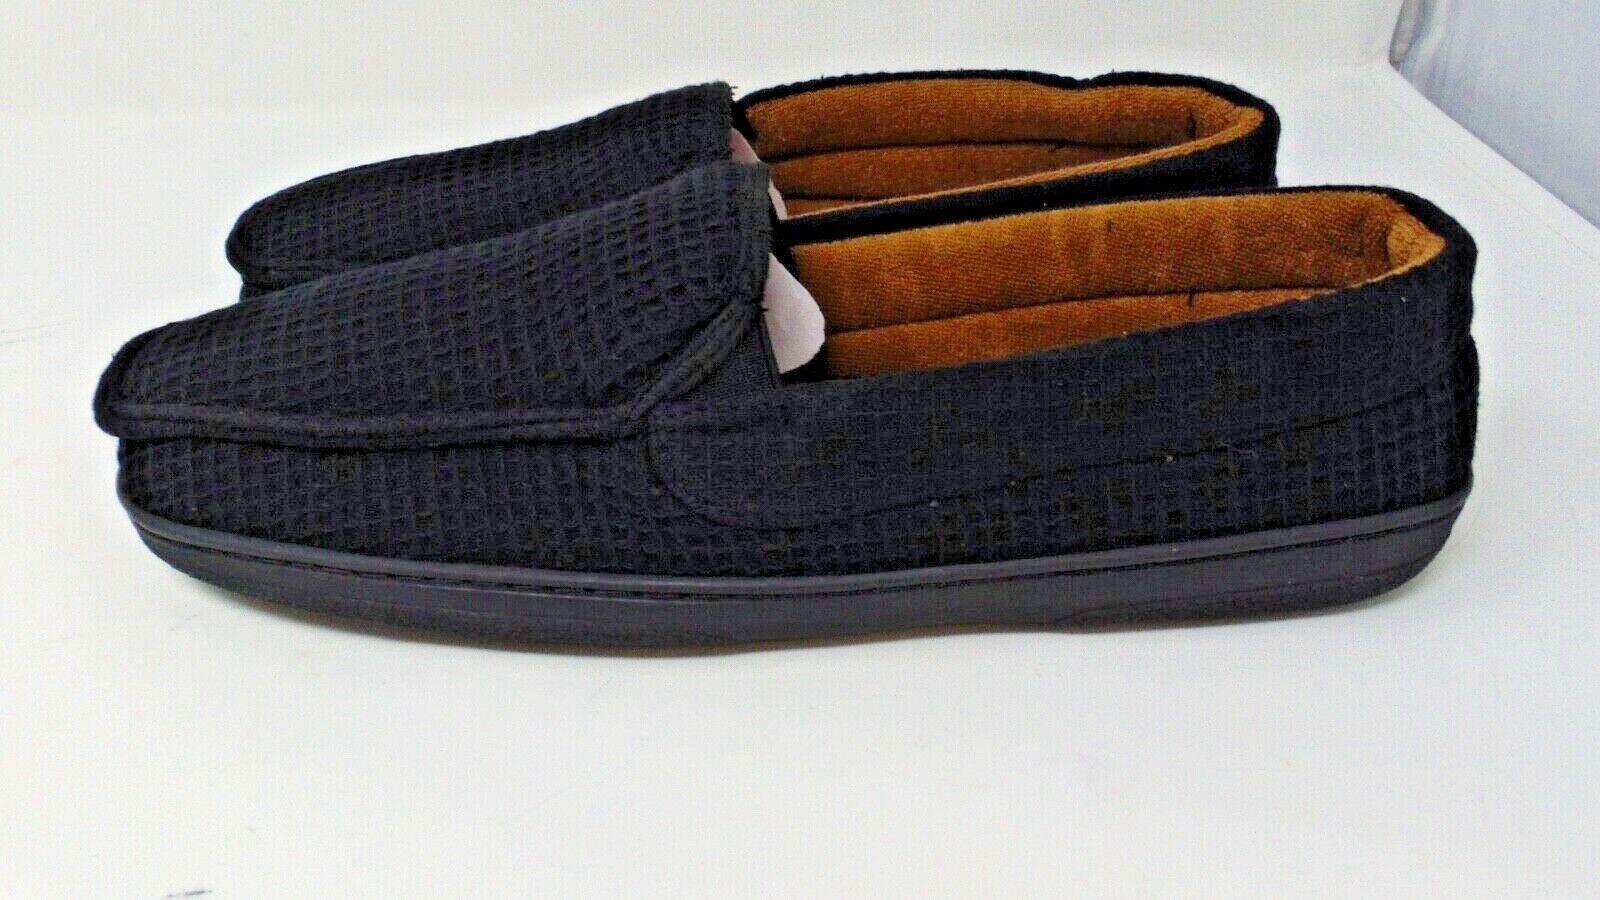 Health Rite Men's Soft Weave Slippers Width EEE Size 10